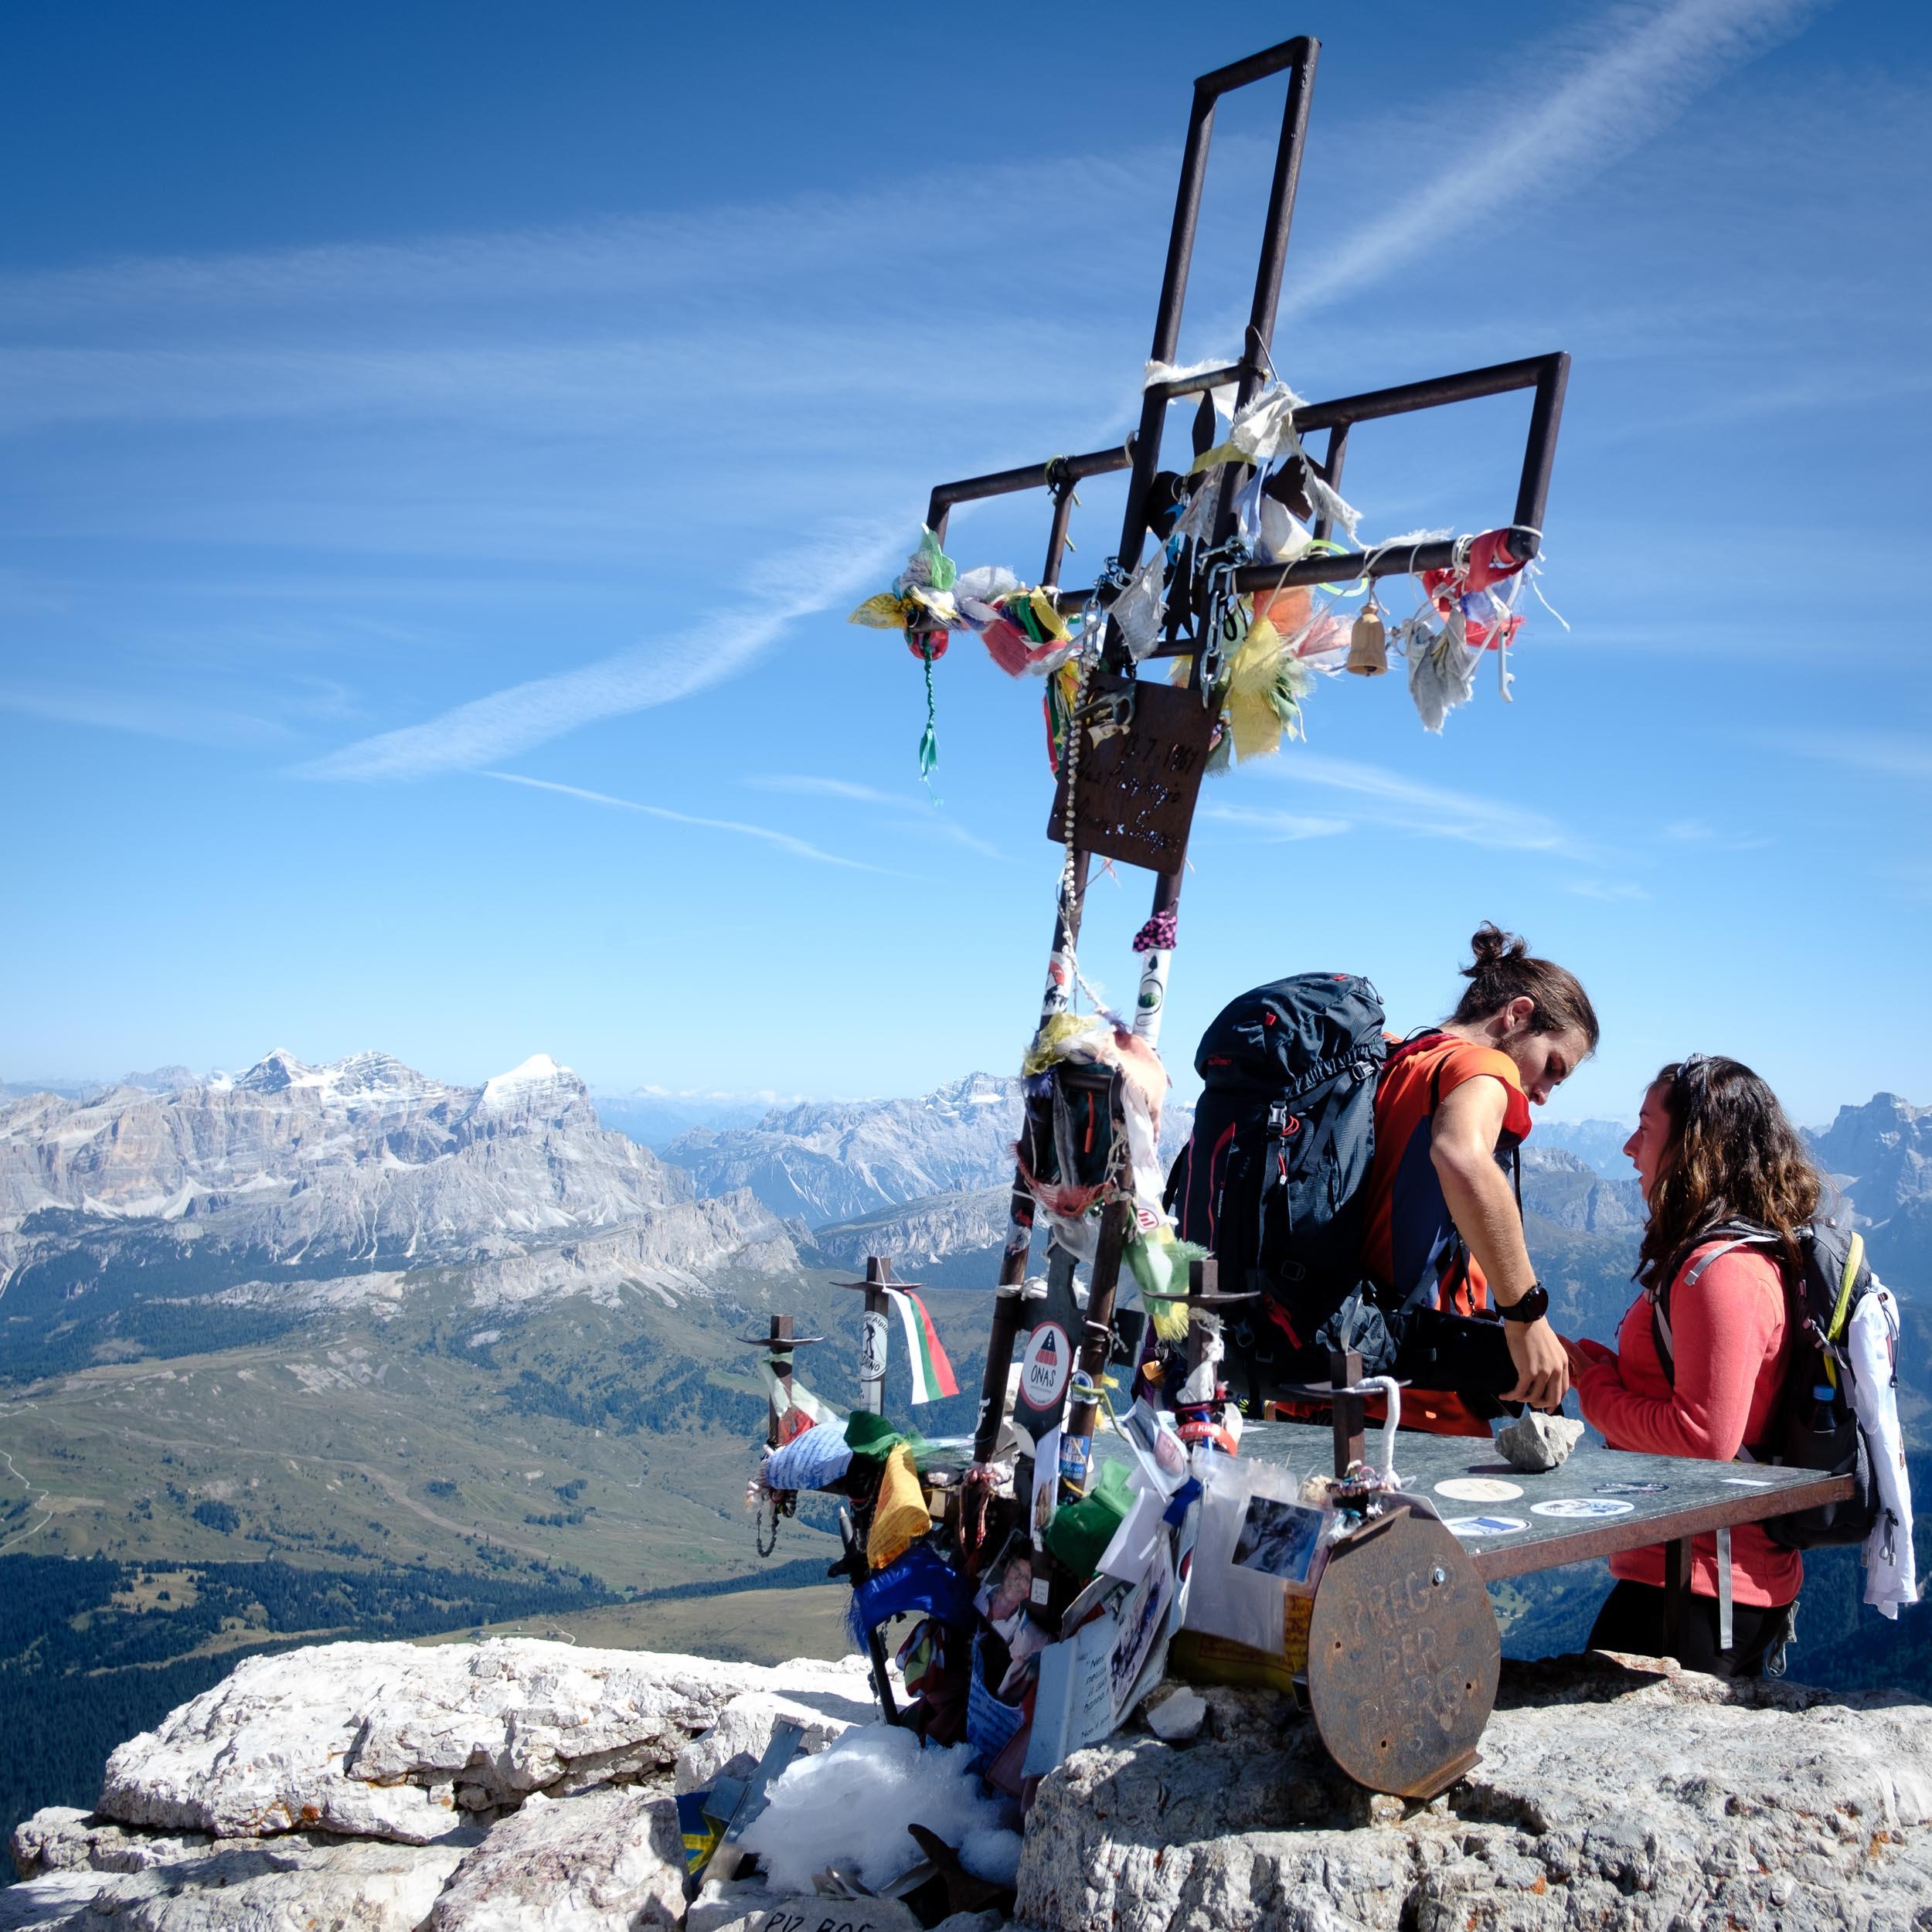 Gipfelkreuz, Piz Boé, Sella, Dolomiten, Italien